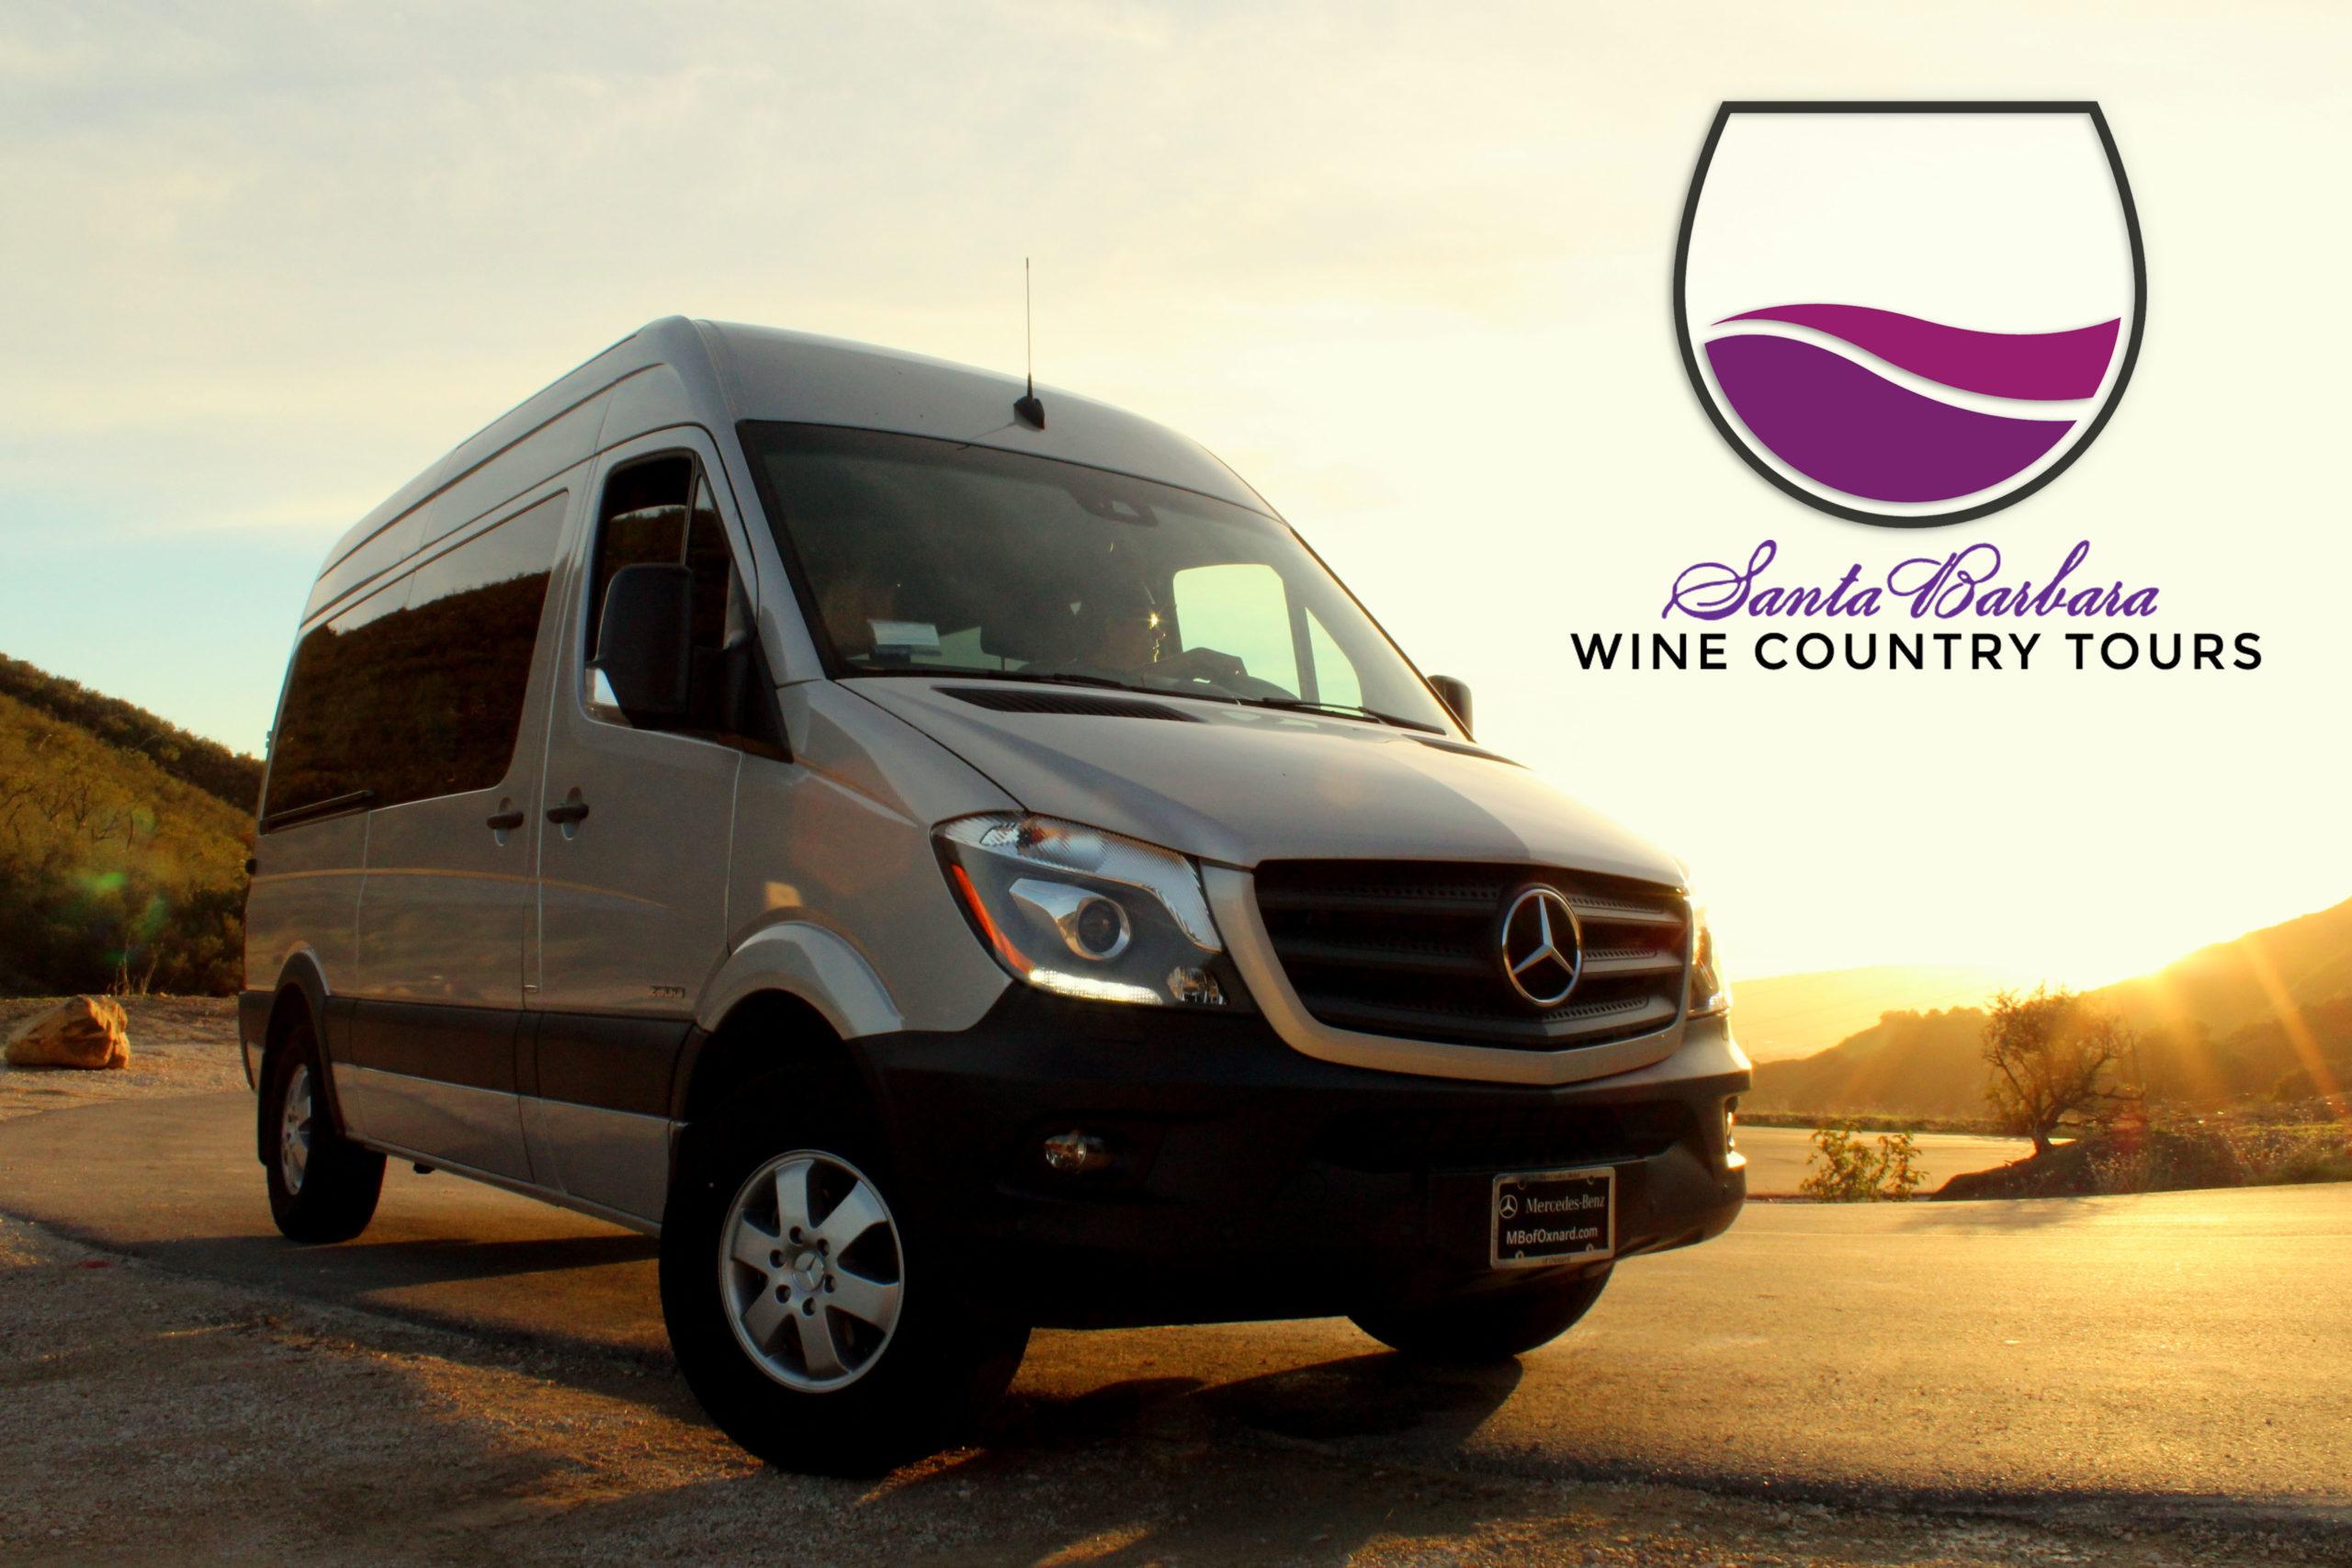 Santa barbara wine country tours logo with mercedes van